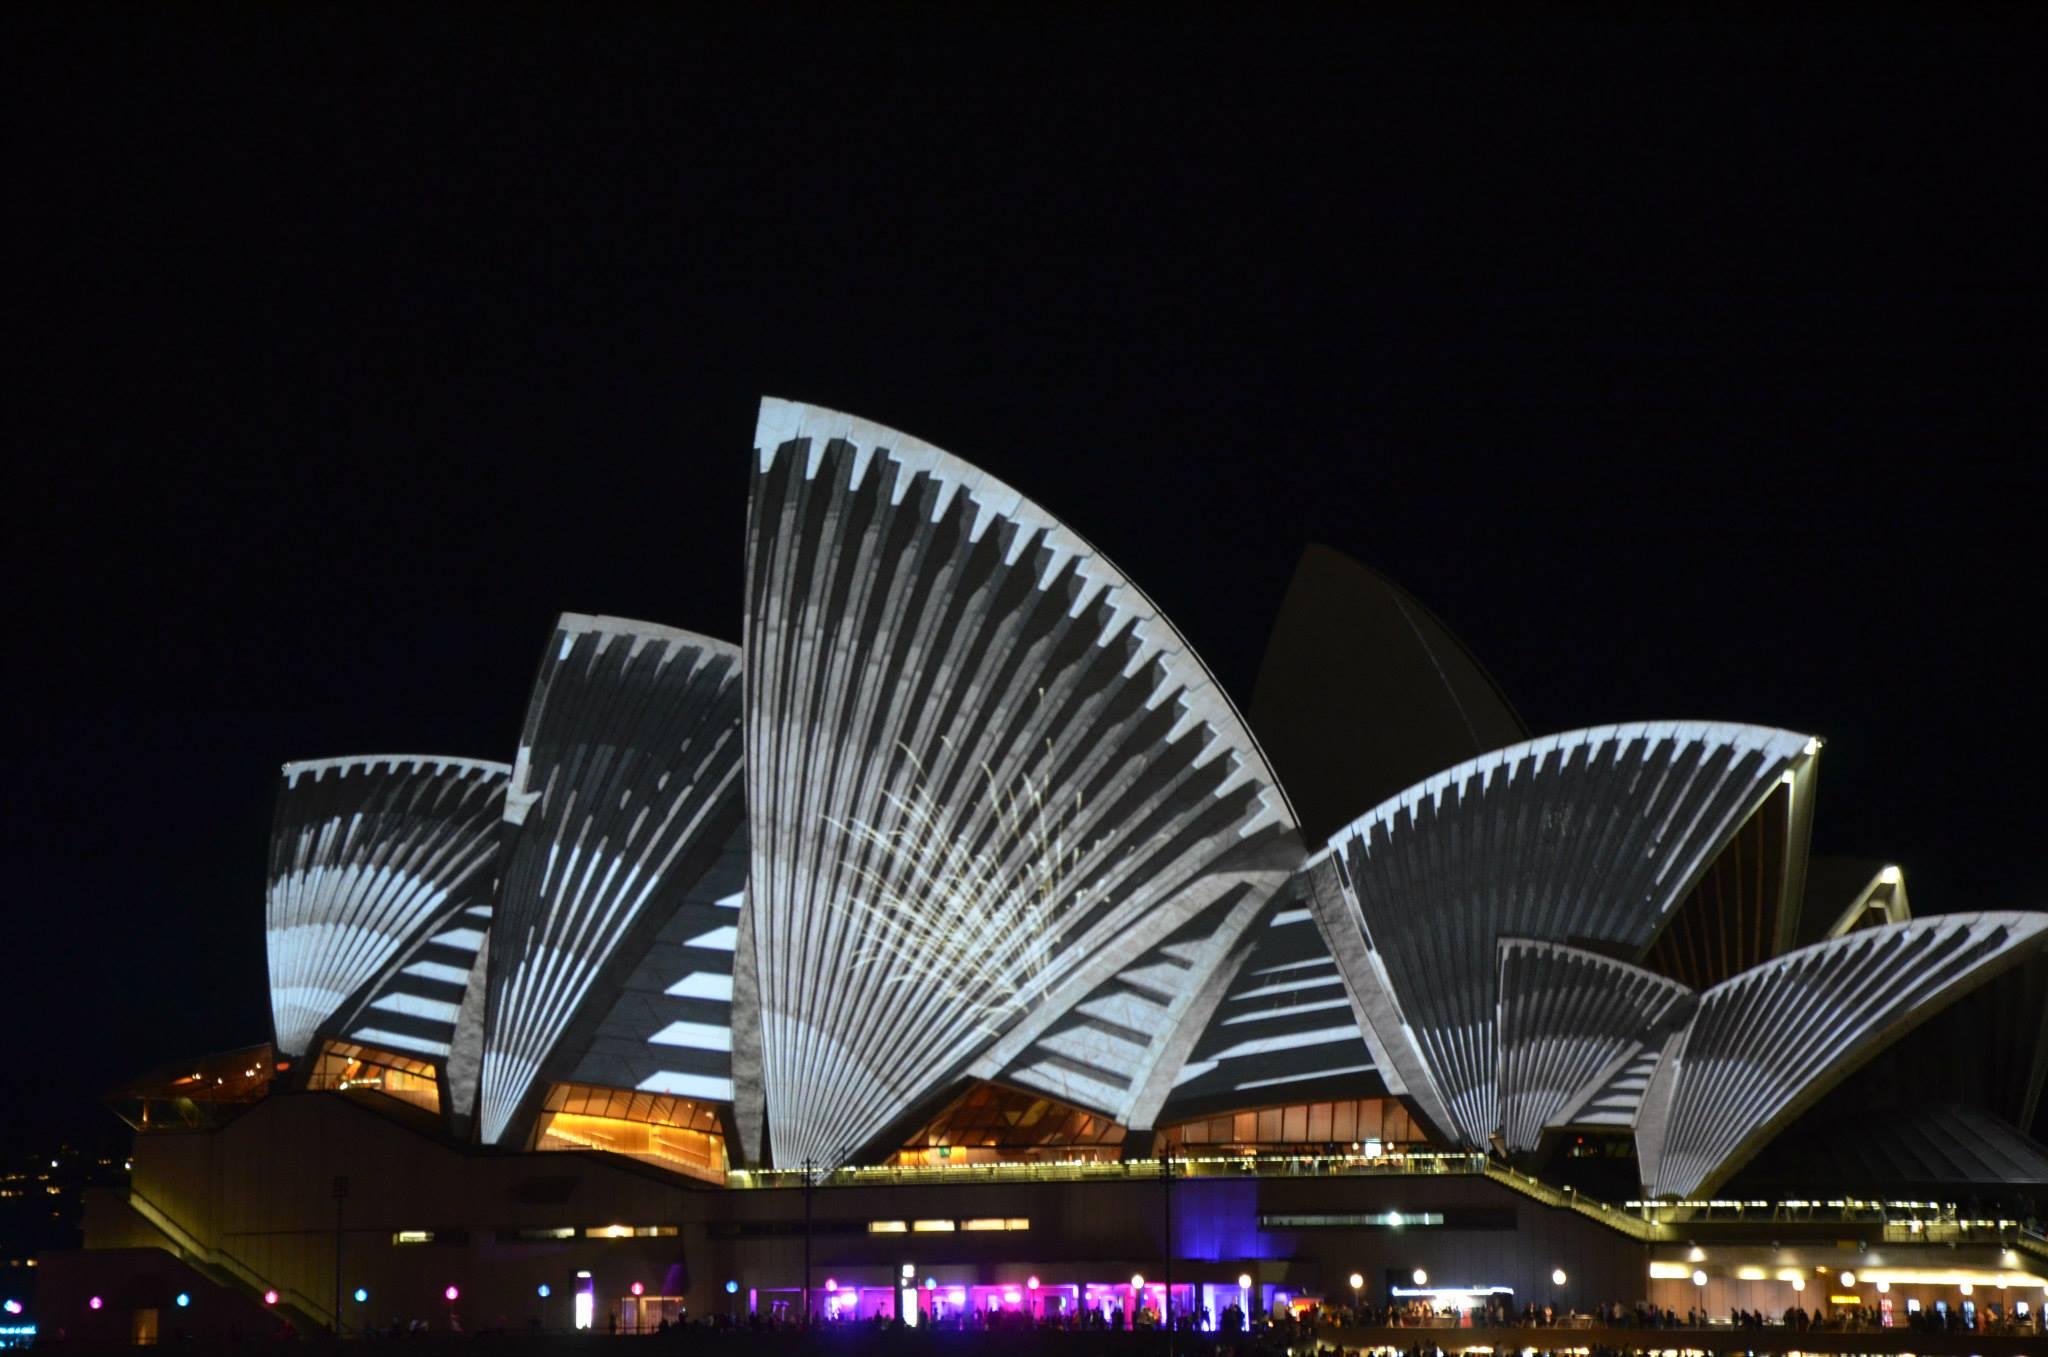 vivid sydney 2014 photo 5